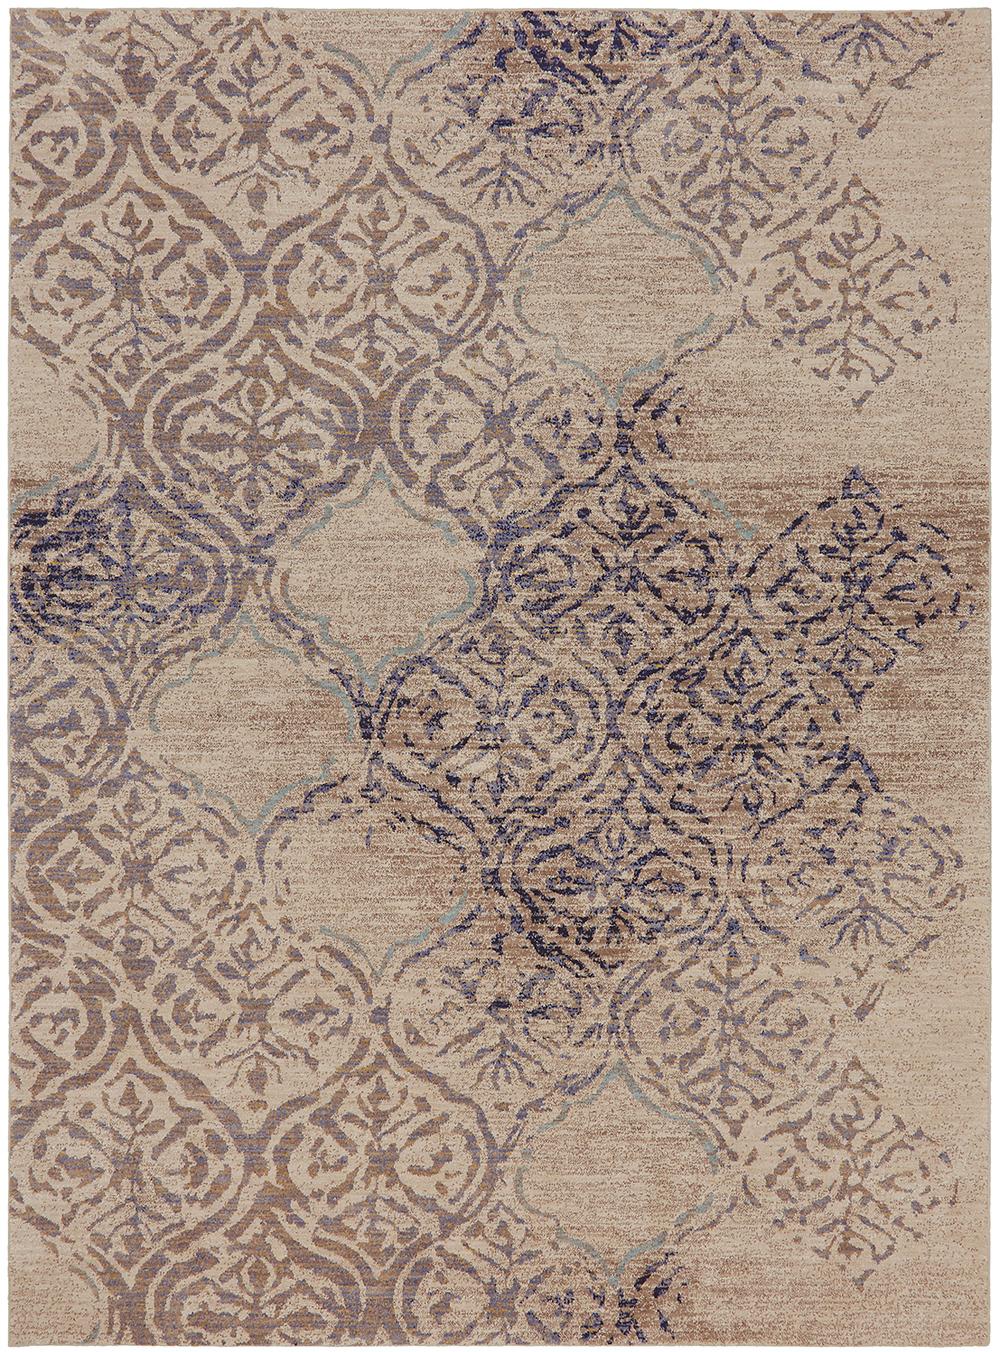 Karastan Cosmopolitan Zendaya Indigo by Virginia Langley Antique White Rug